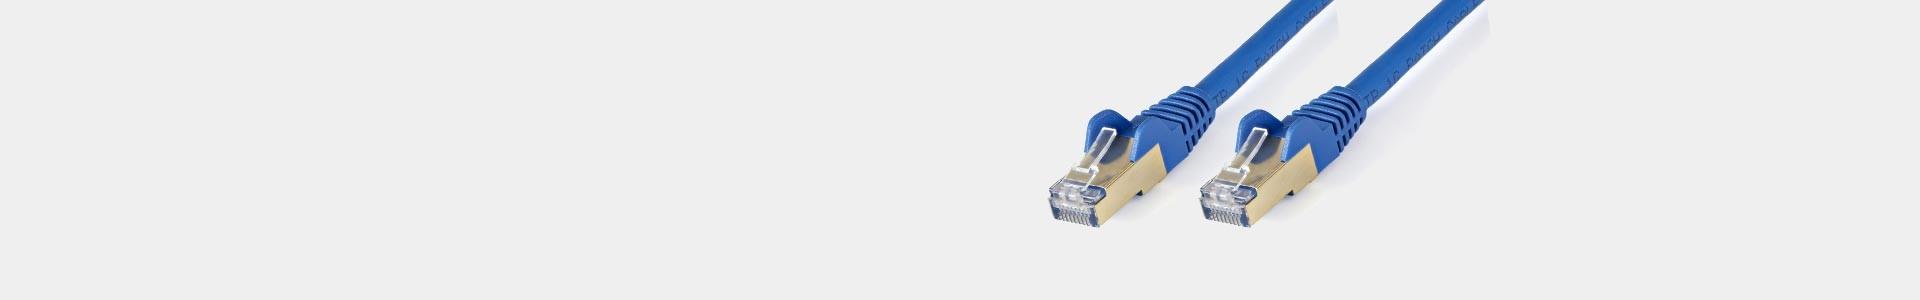 Cables RJ-45 profesionales - Calidad certificada - Avacab